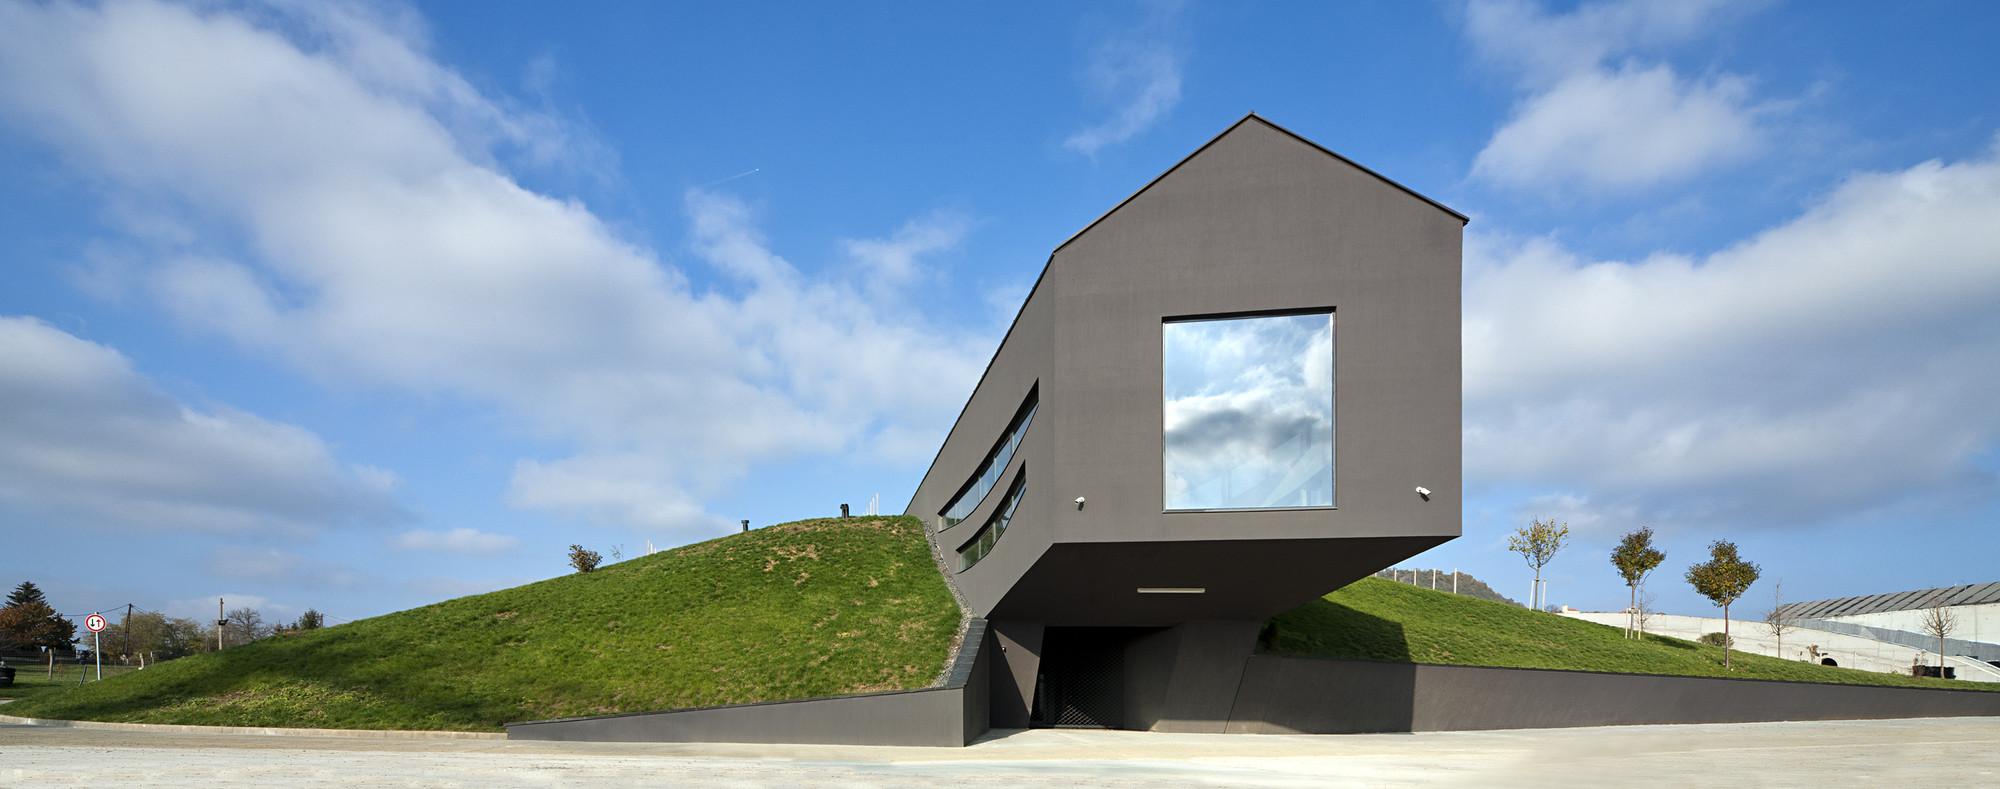 Somlo Winery Complex / Ekler Architect, © Tamás Bujnovszky